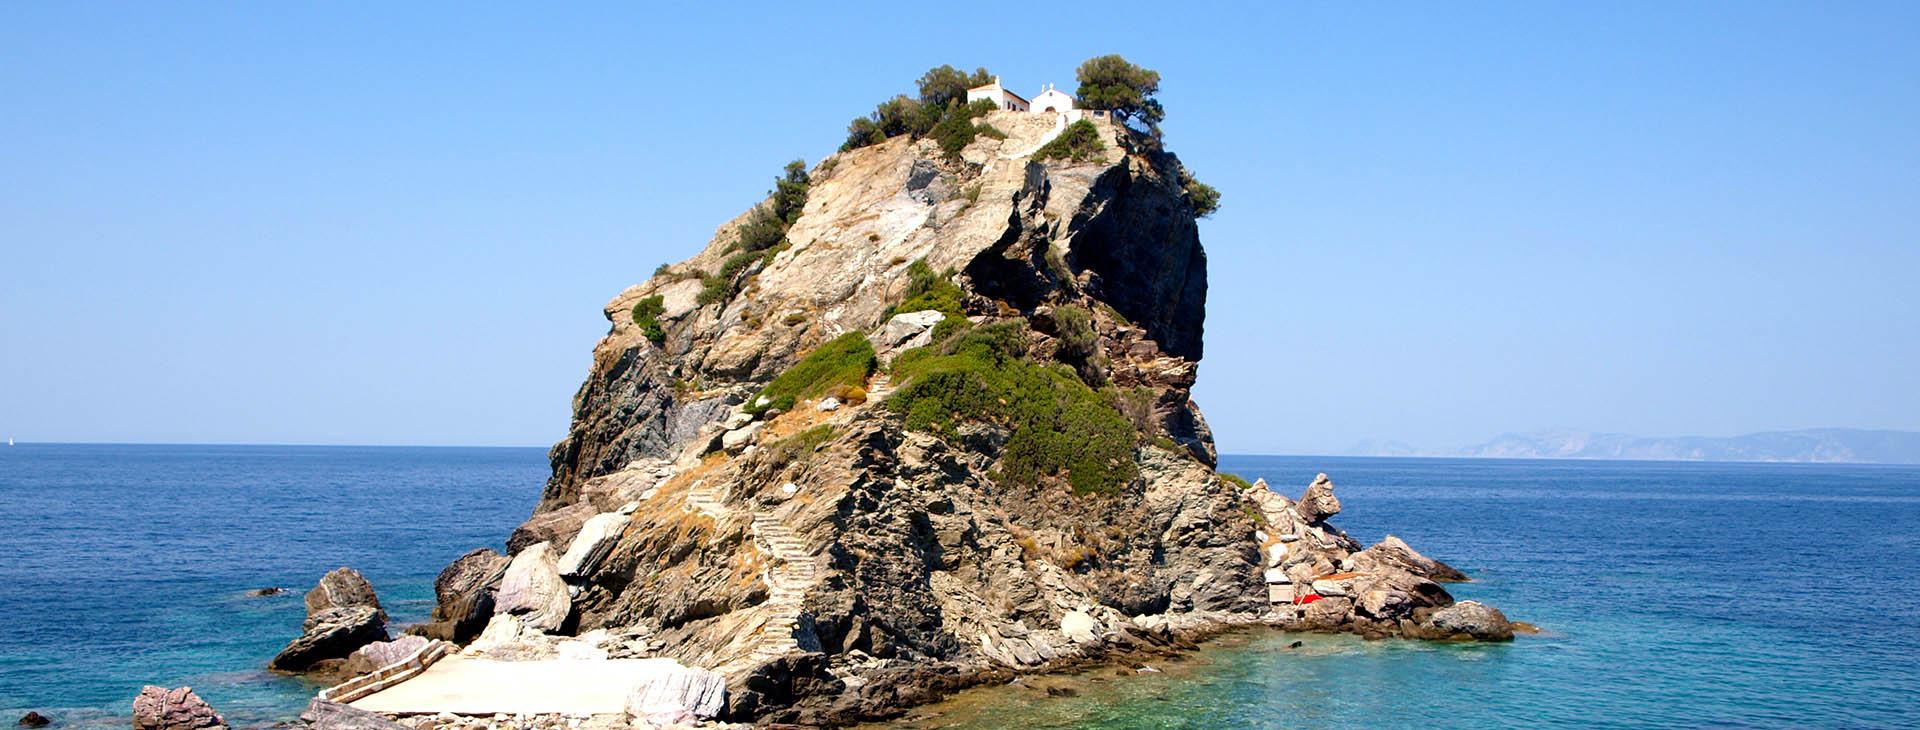 Agios Ioannis Chapel (Mamma Mia movie location), Skopelos